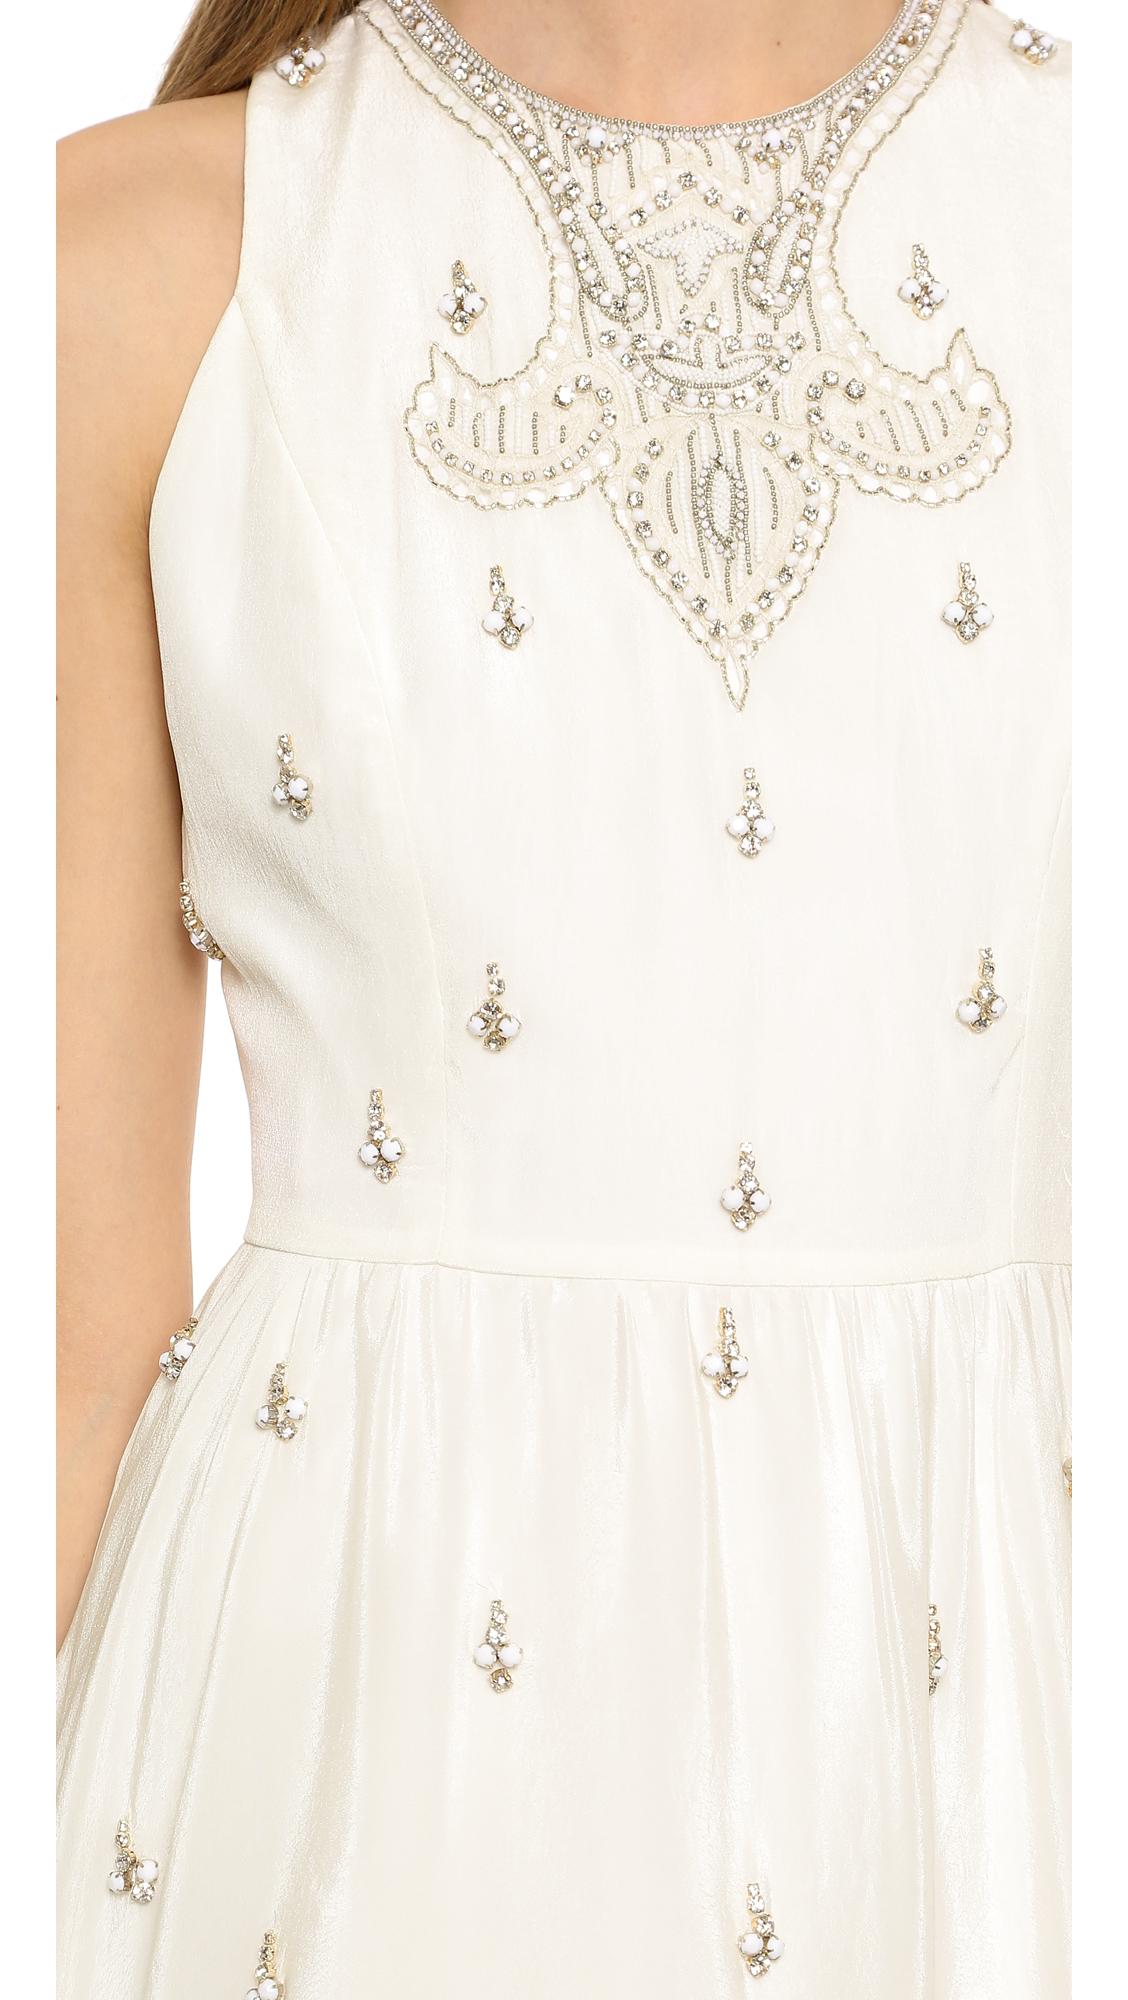 57cb2a3e22d alice + olivia Gilda Embellished Lace Back Dress